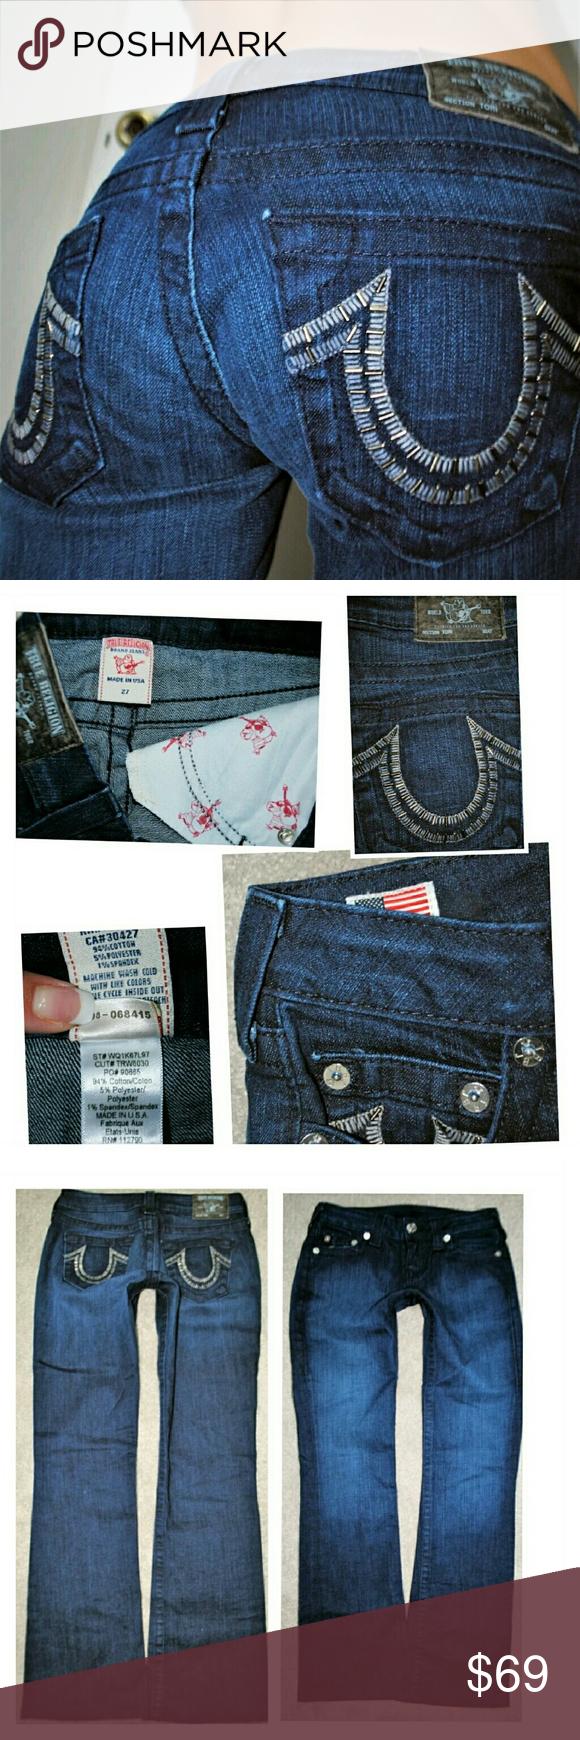 TRUE RELIGION TORI BOOTCUT DENIM JEANS 4 27 X 30 Authentic  Hemmed True Religion Jeans Boot Cut